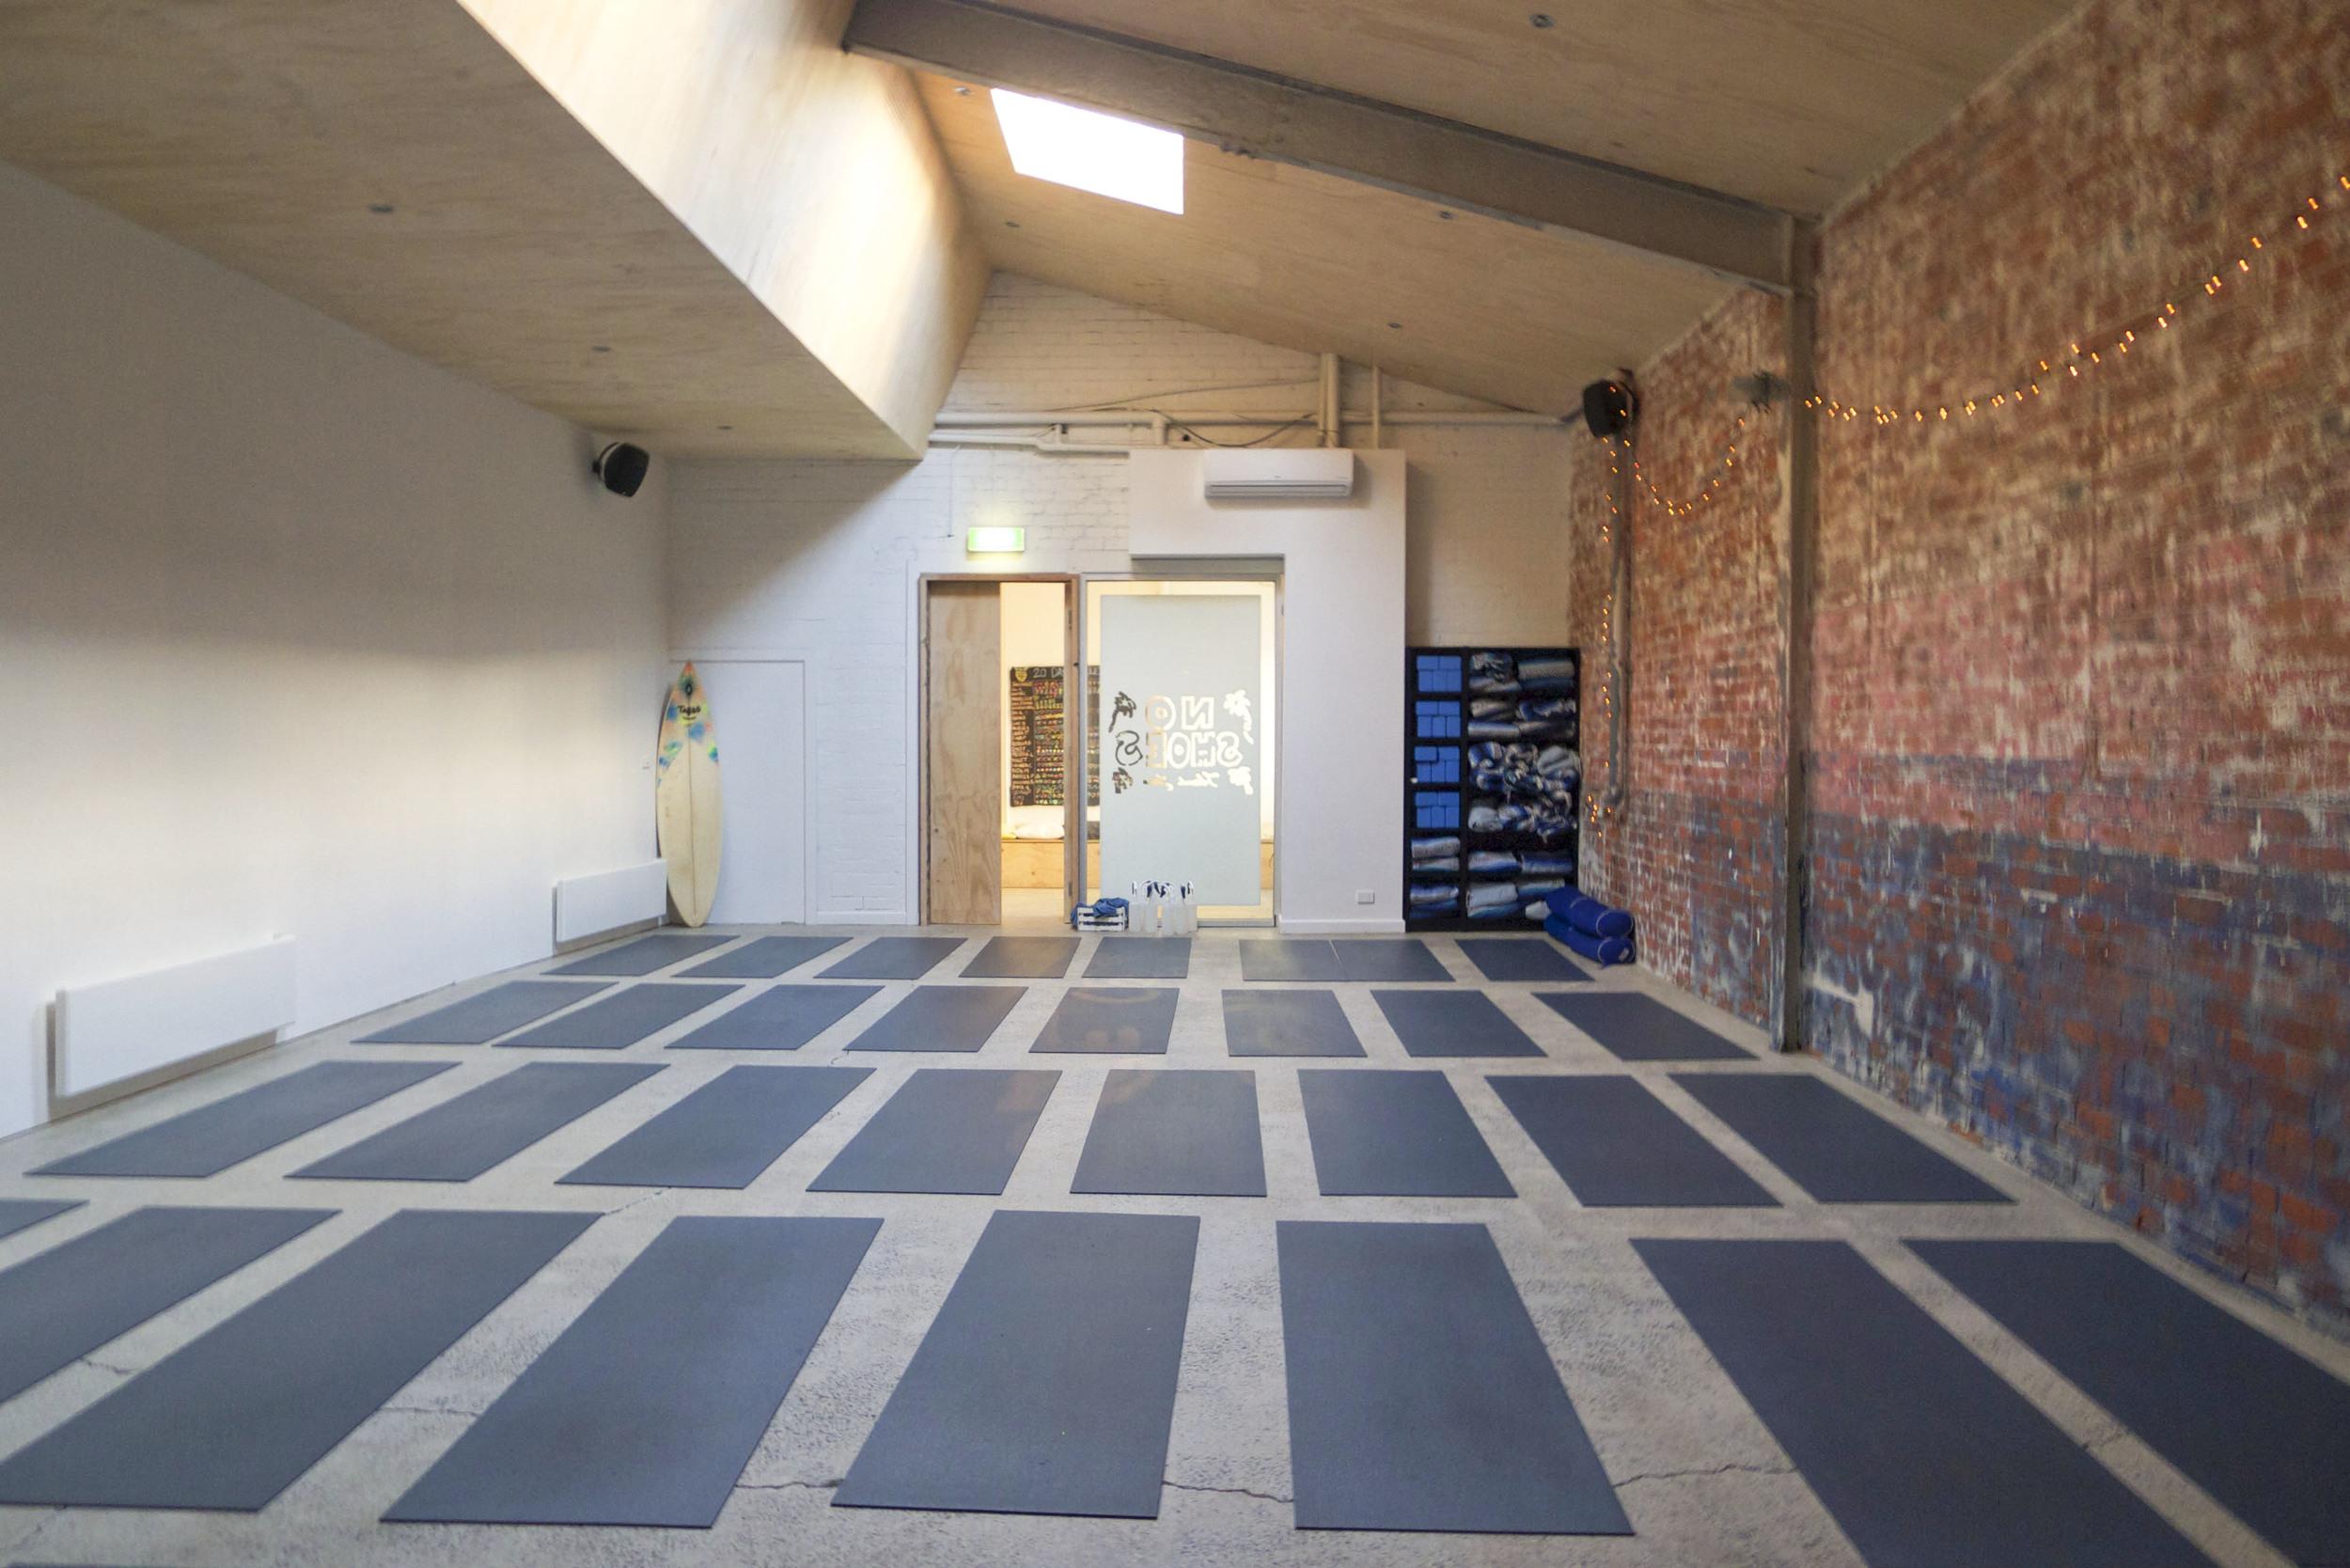 Yoga 213, Prahran, Melbourne, Australia2783.jpg